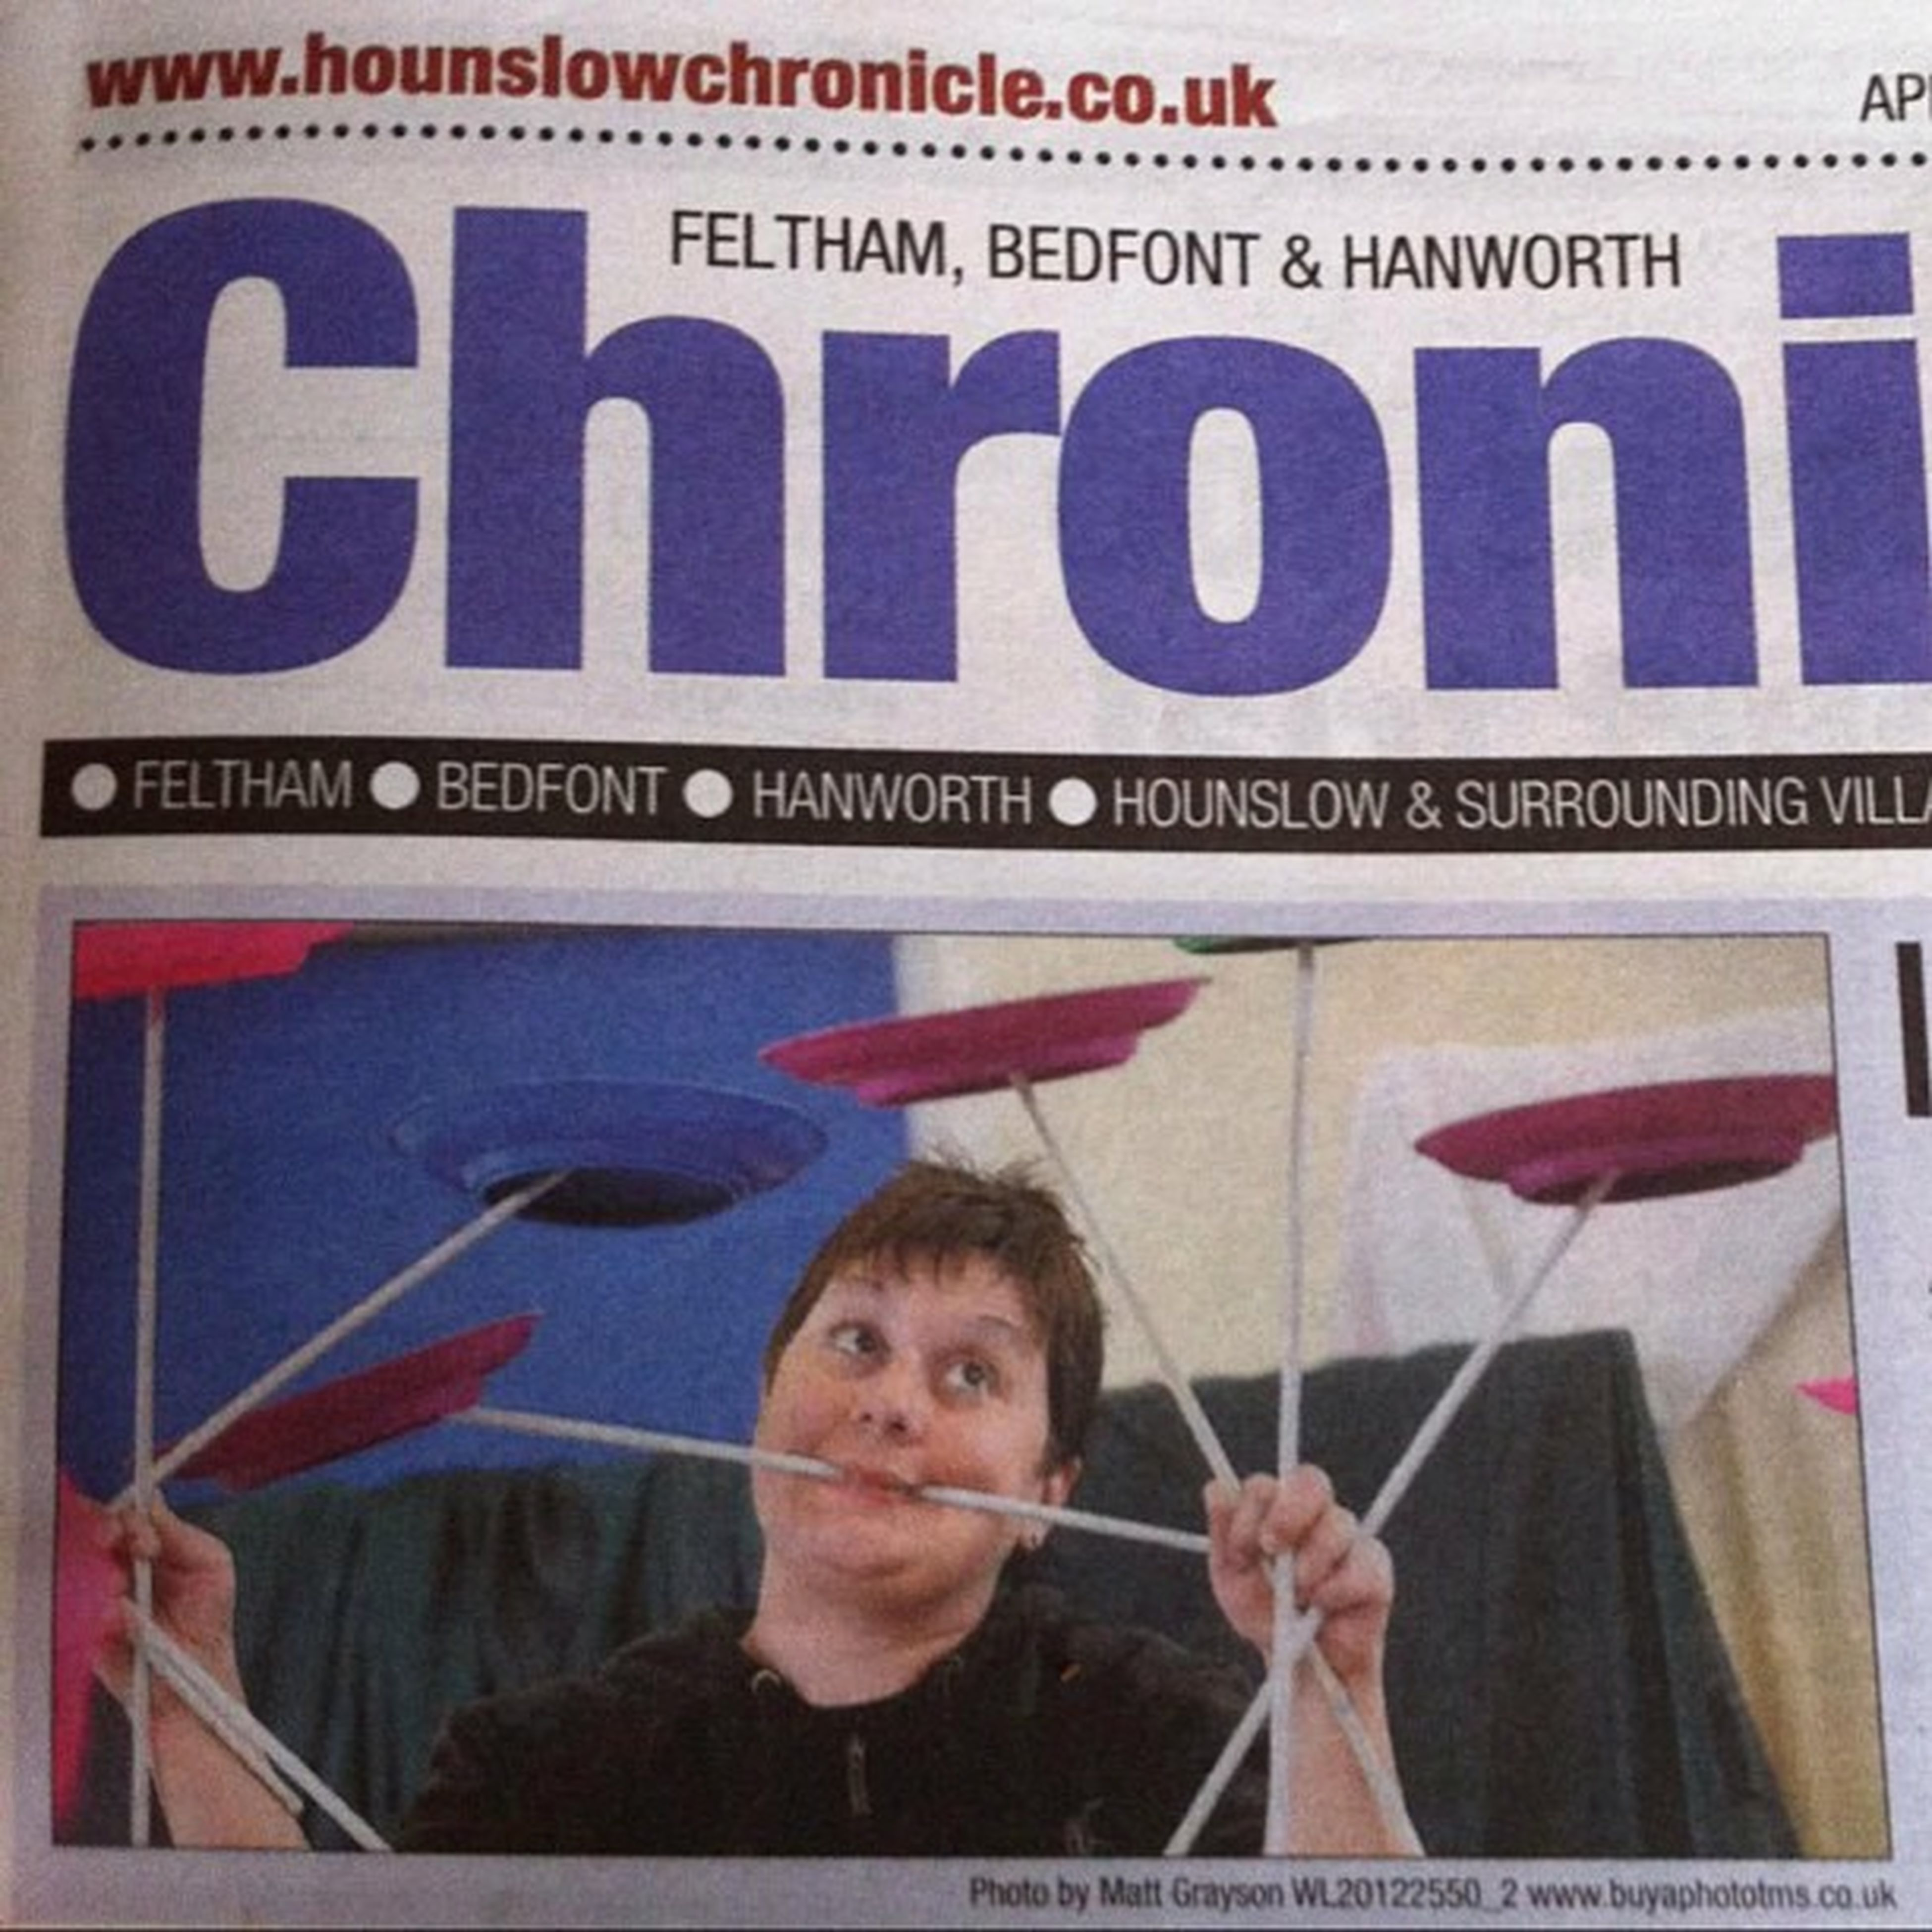 Plate_spinning Circus_skills Poi_passion Me Newspaper Fun